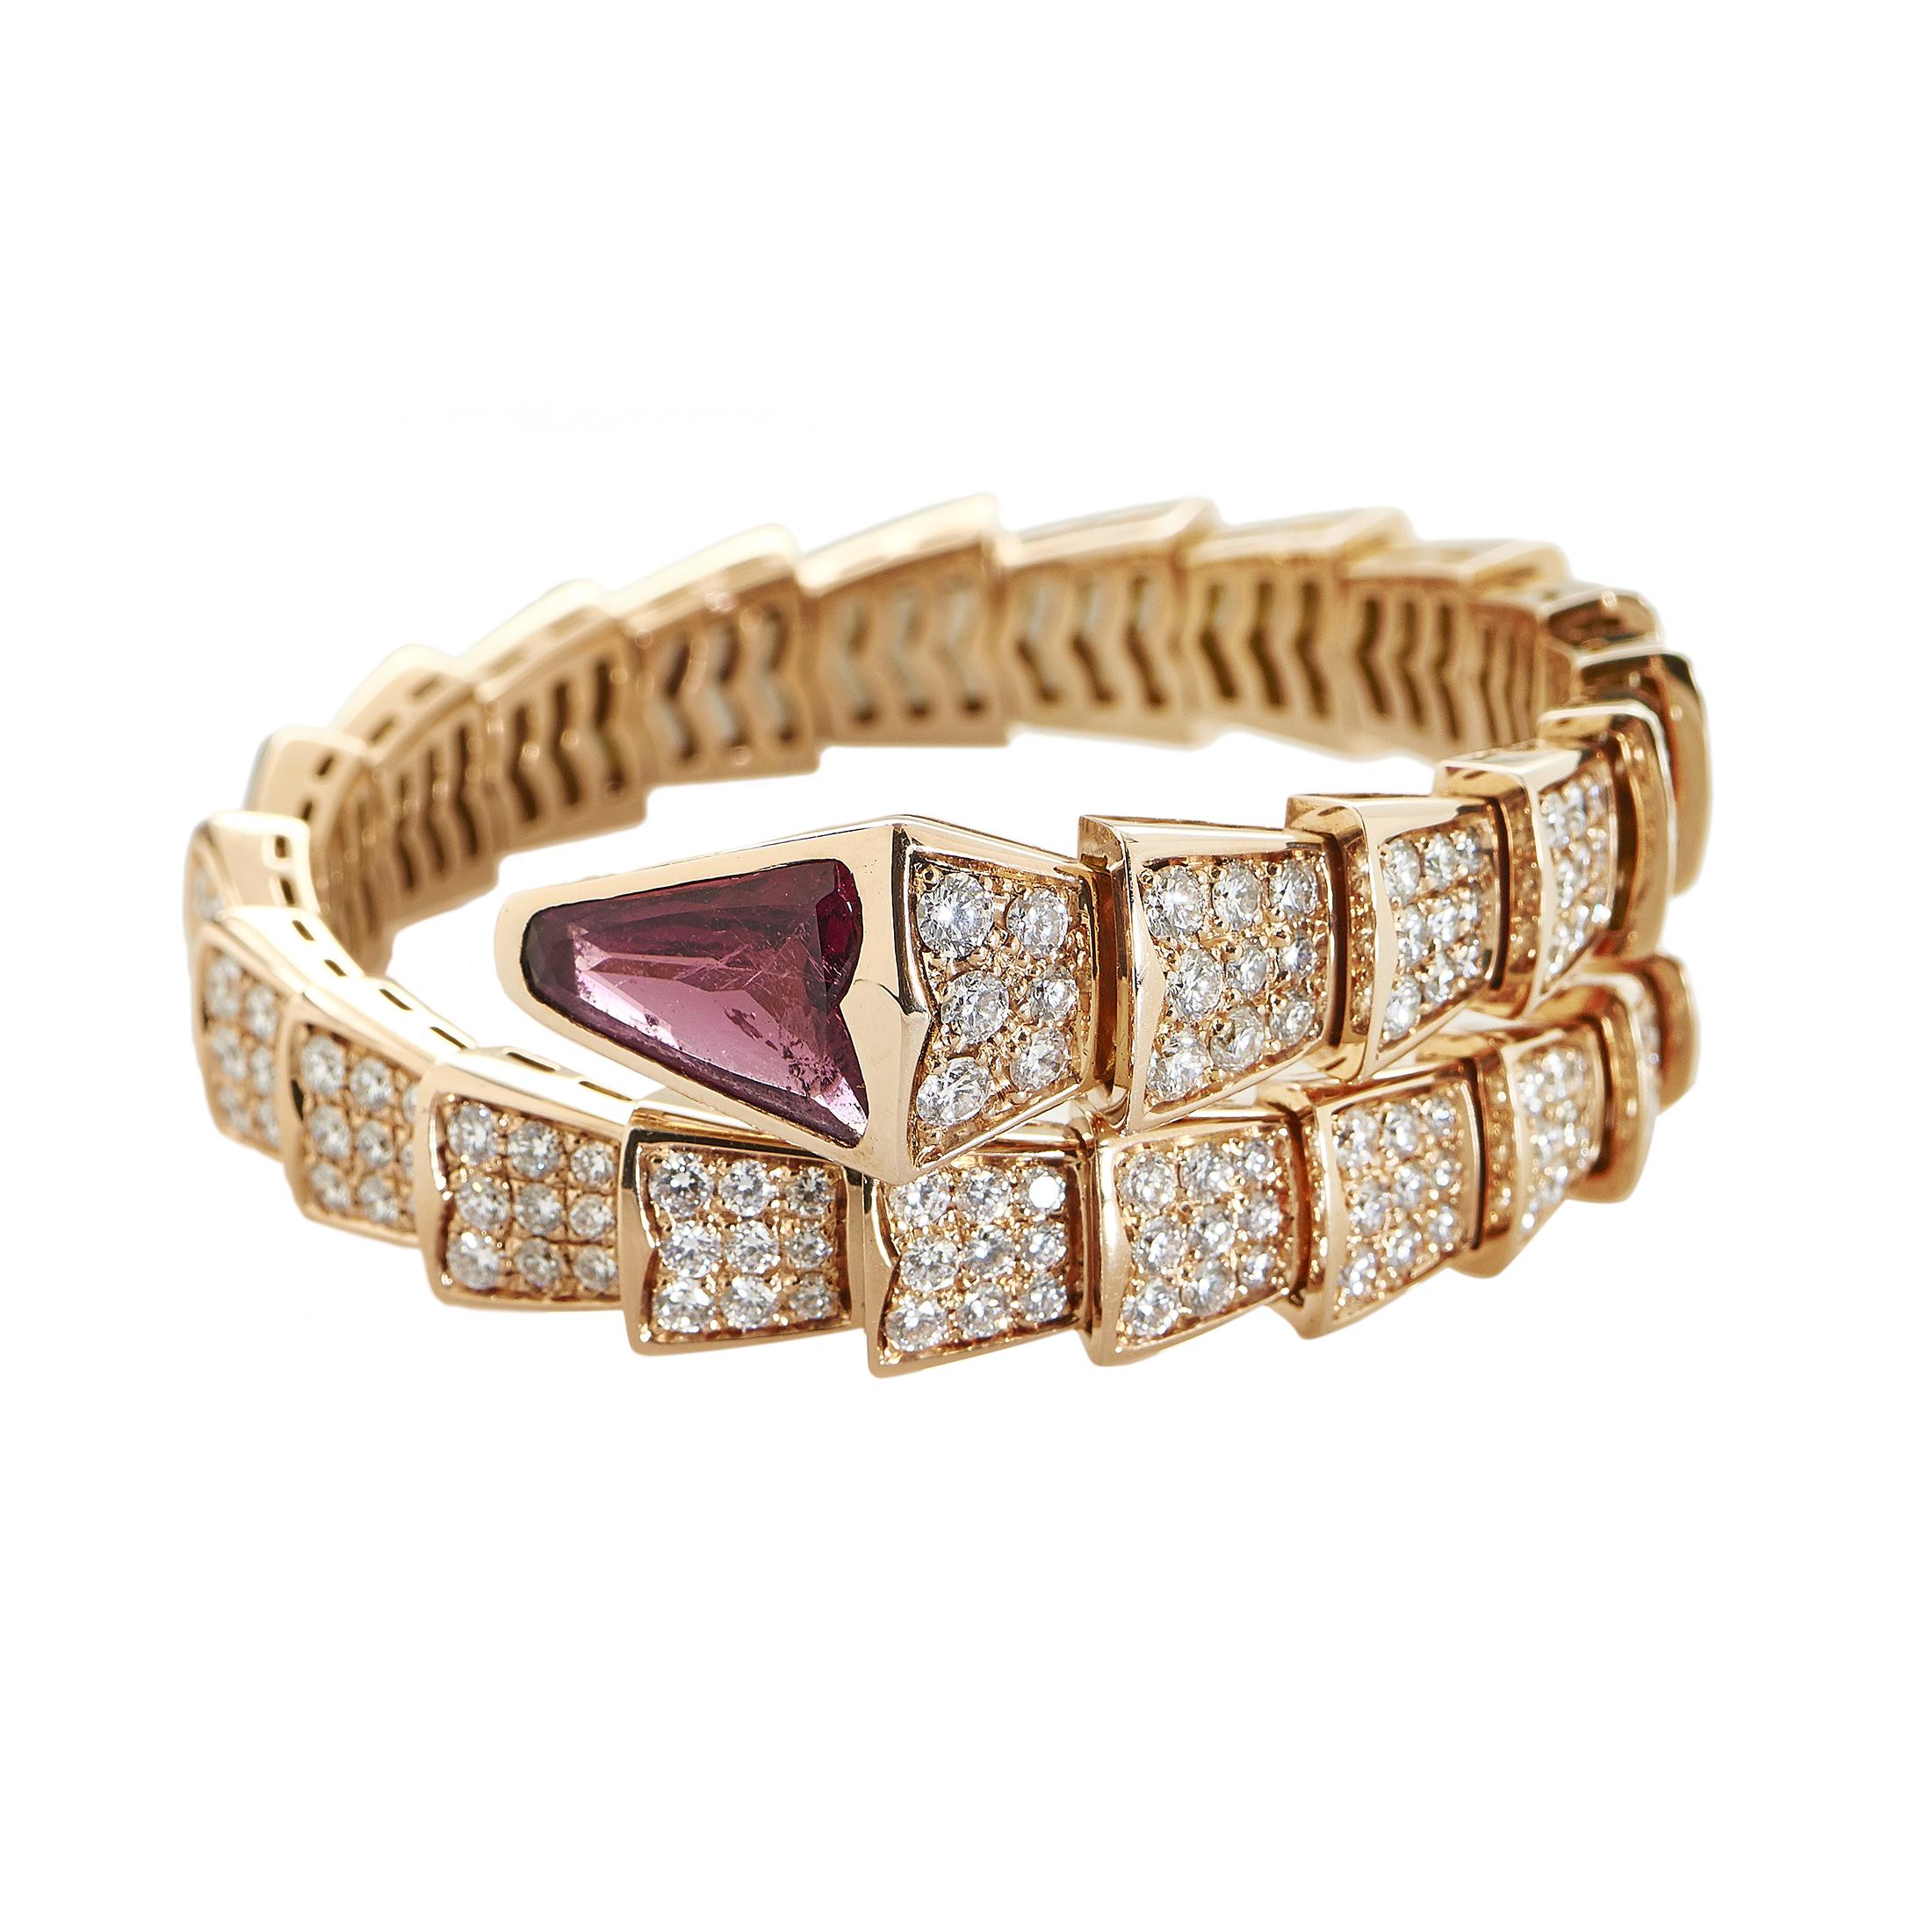 Serpenti Women's 18K Rose Gold Full Diamond Pave & Rubellite Small Bracelet